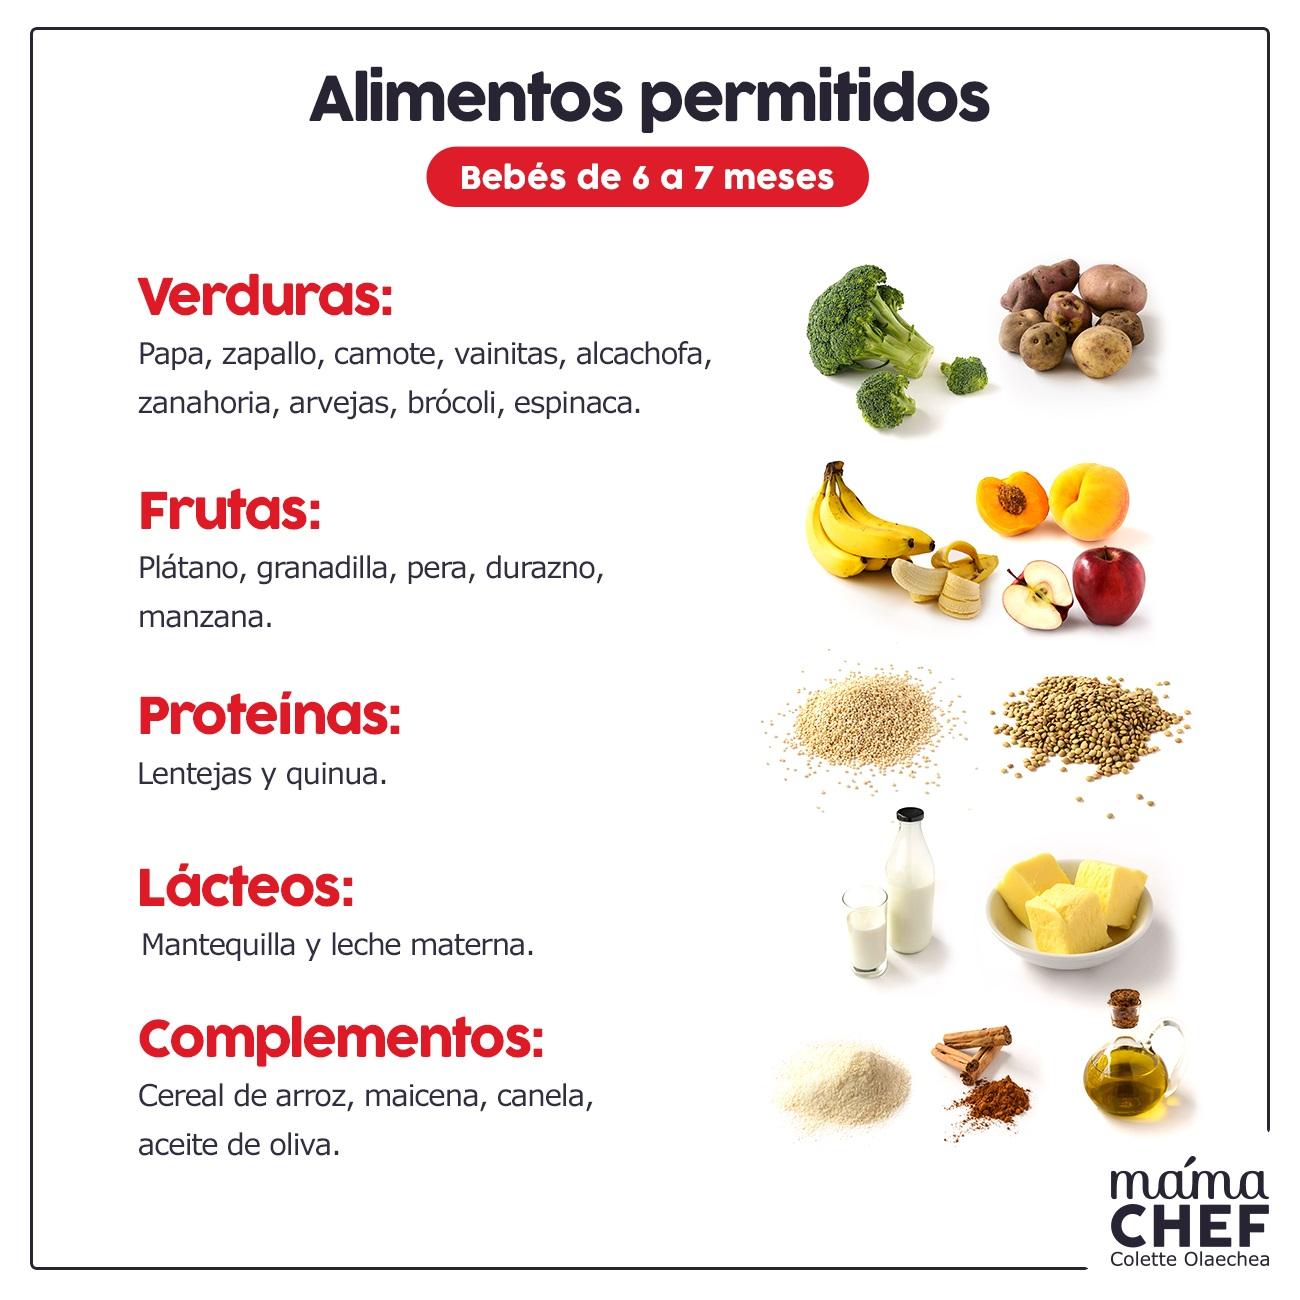 Papillas Alimentos permitidos bebes 6 meses Mama Chef Colette Olaechea